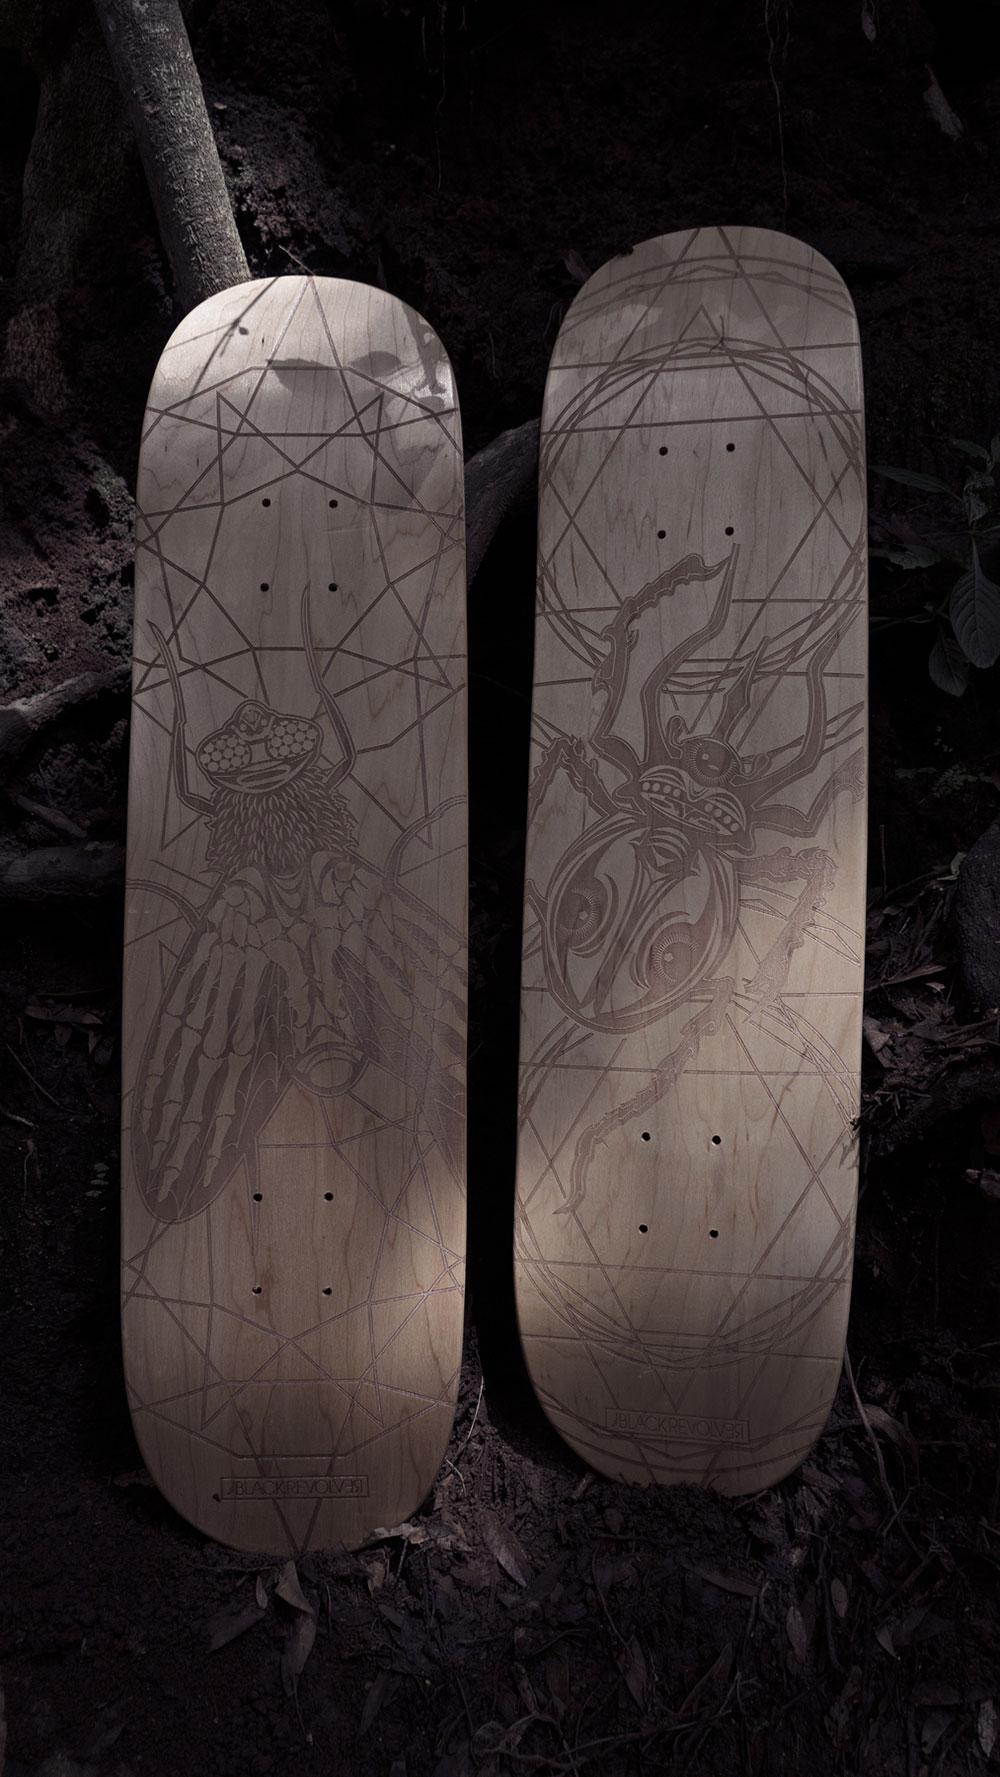 Black Revolver Animalia & Insecta Collective tabla / deck catálogo no29